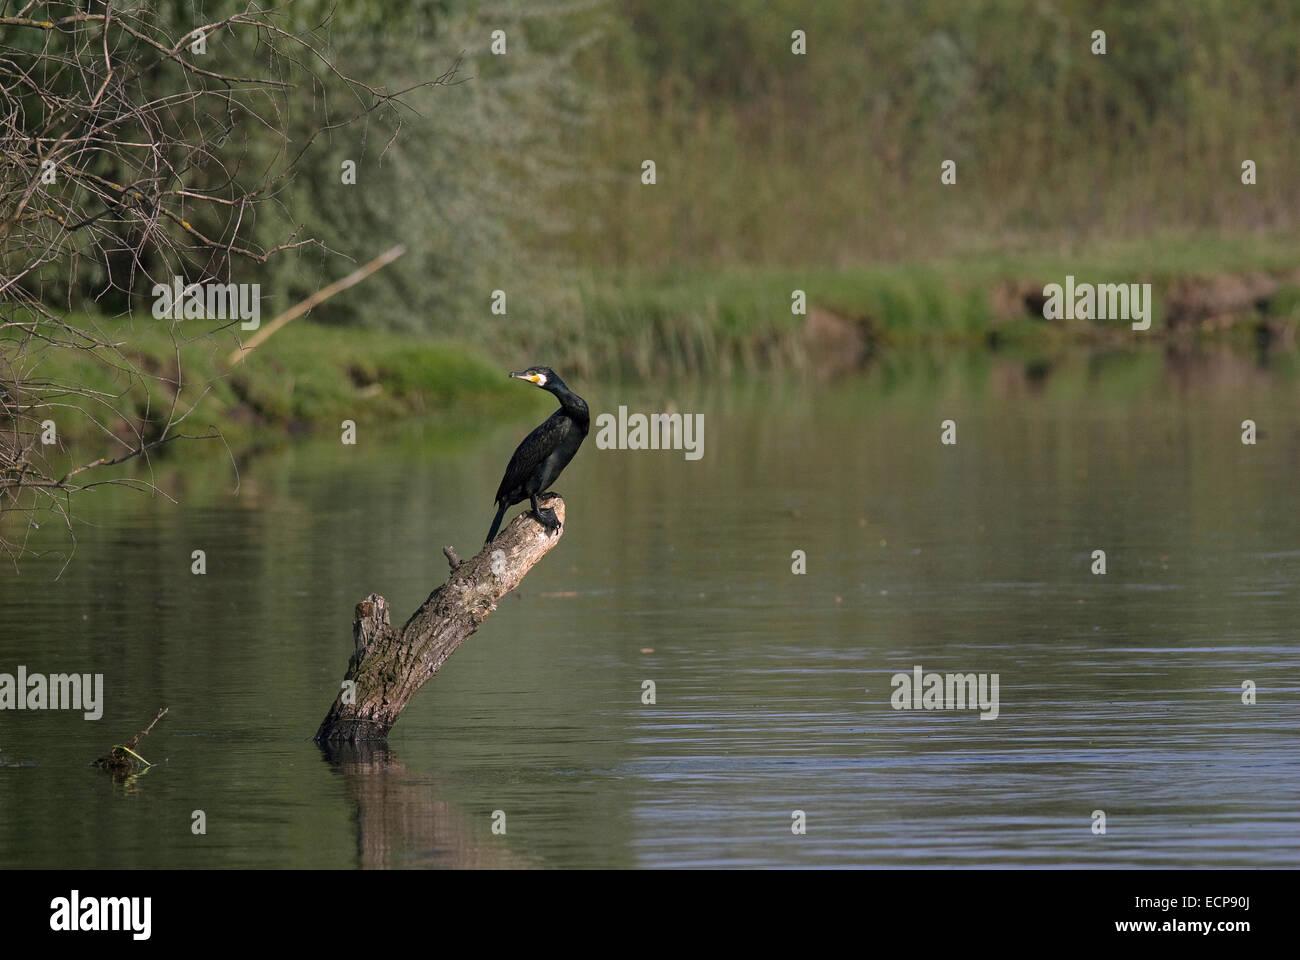 Cormorant (Phalacrocorax carbo), Danube delta, Romania, Europa - Stock Image